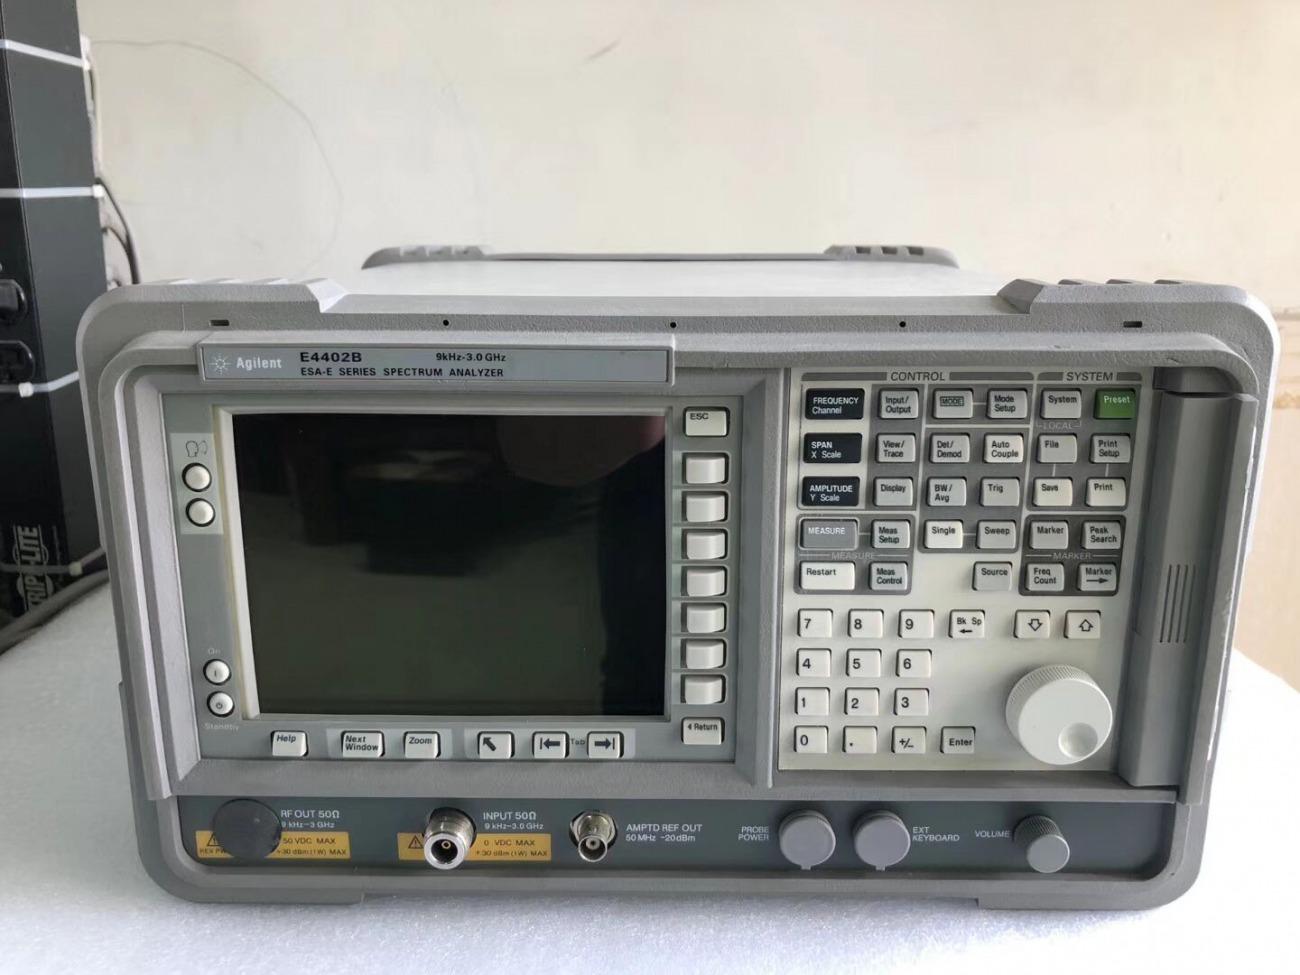 维修HP惠普E4402B Agilent安捷伦E4402B